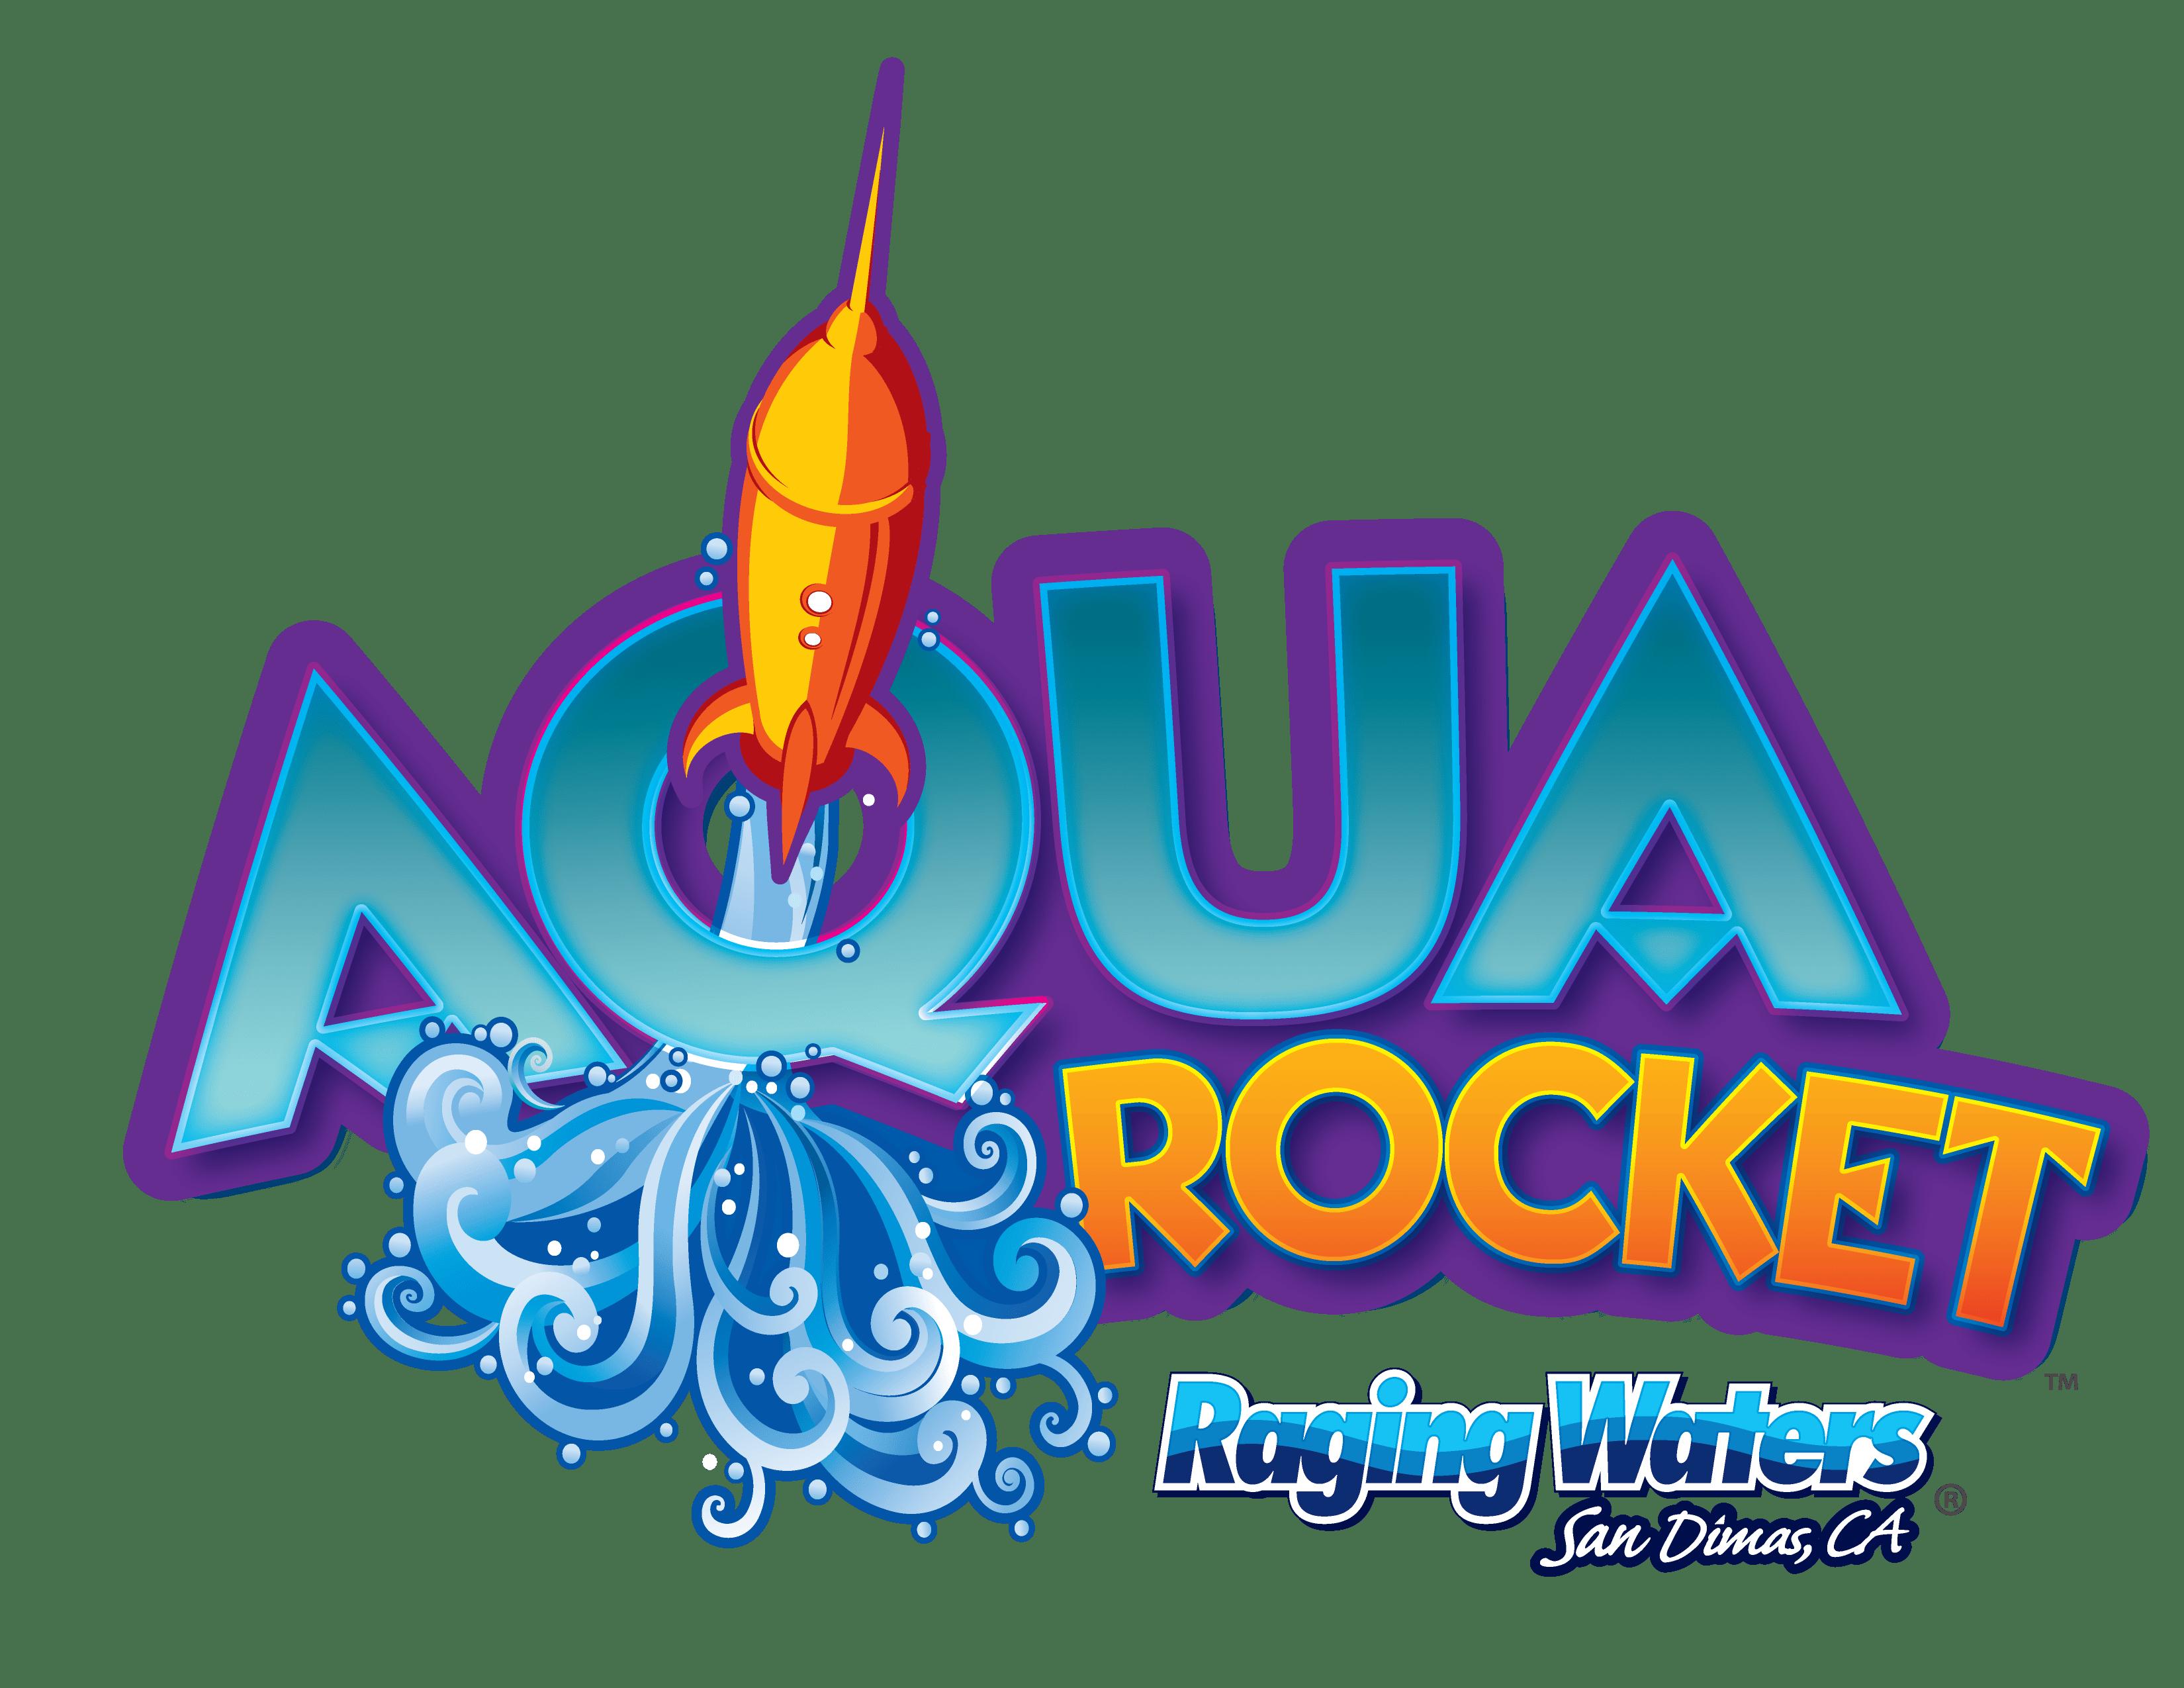 Clipart rocket water rocket. Raging waters san dimas